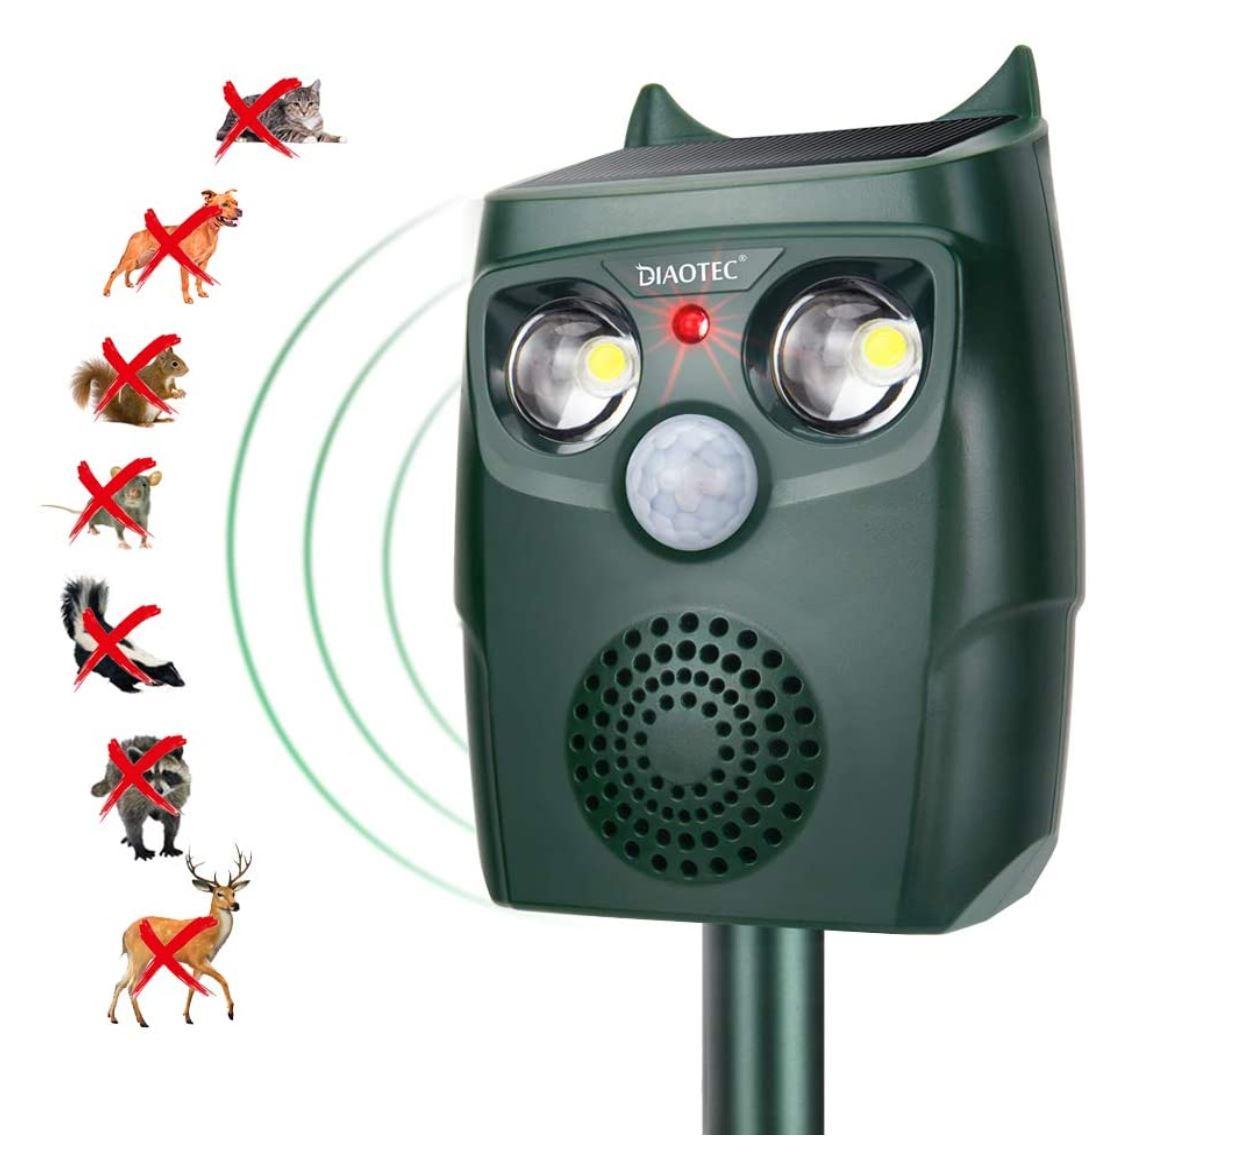 Diaotec – Solar Powered Ultrasonic Animal Outdoor Repeller